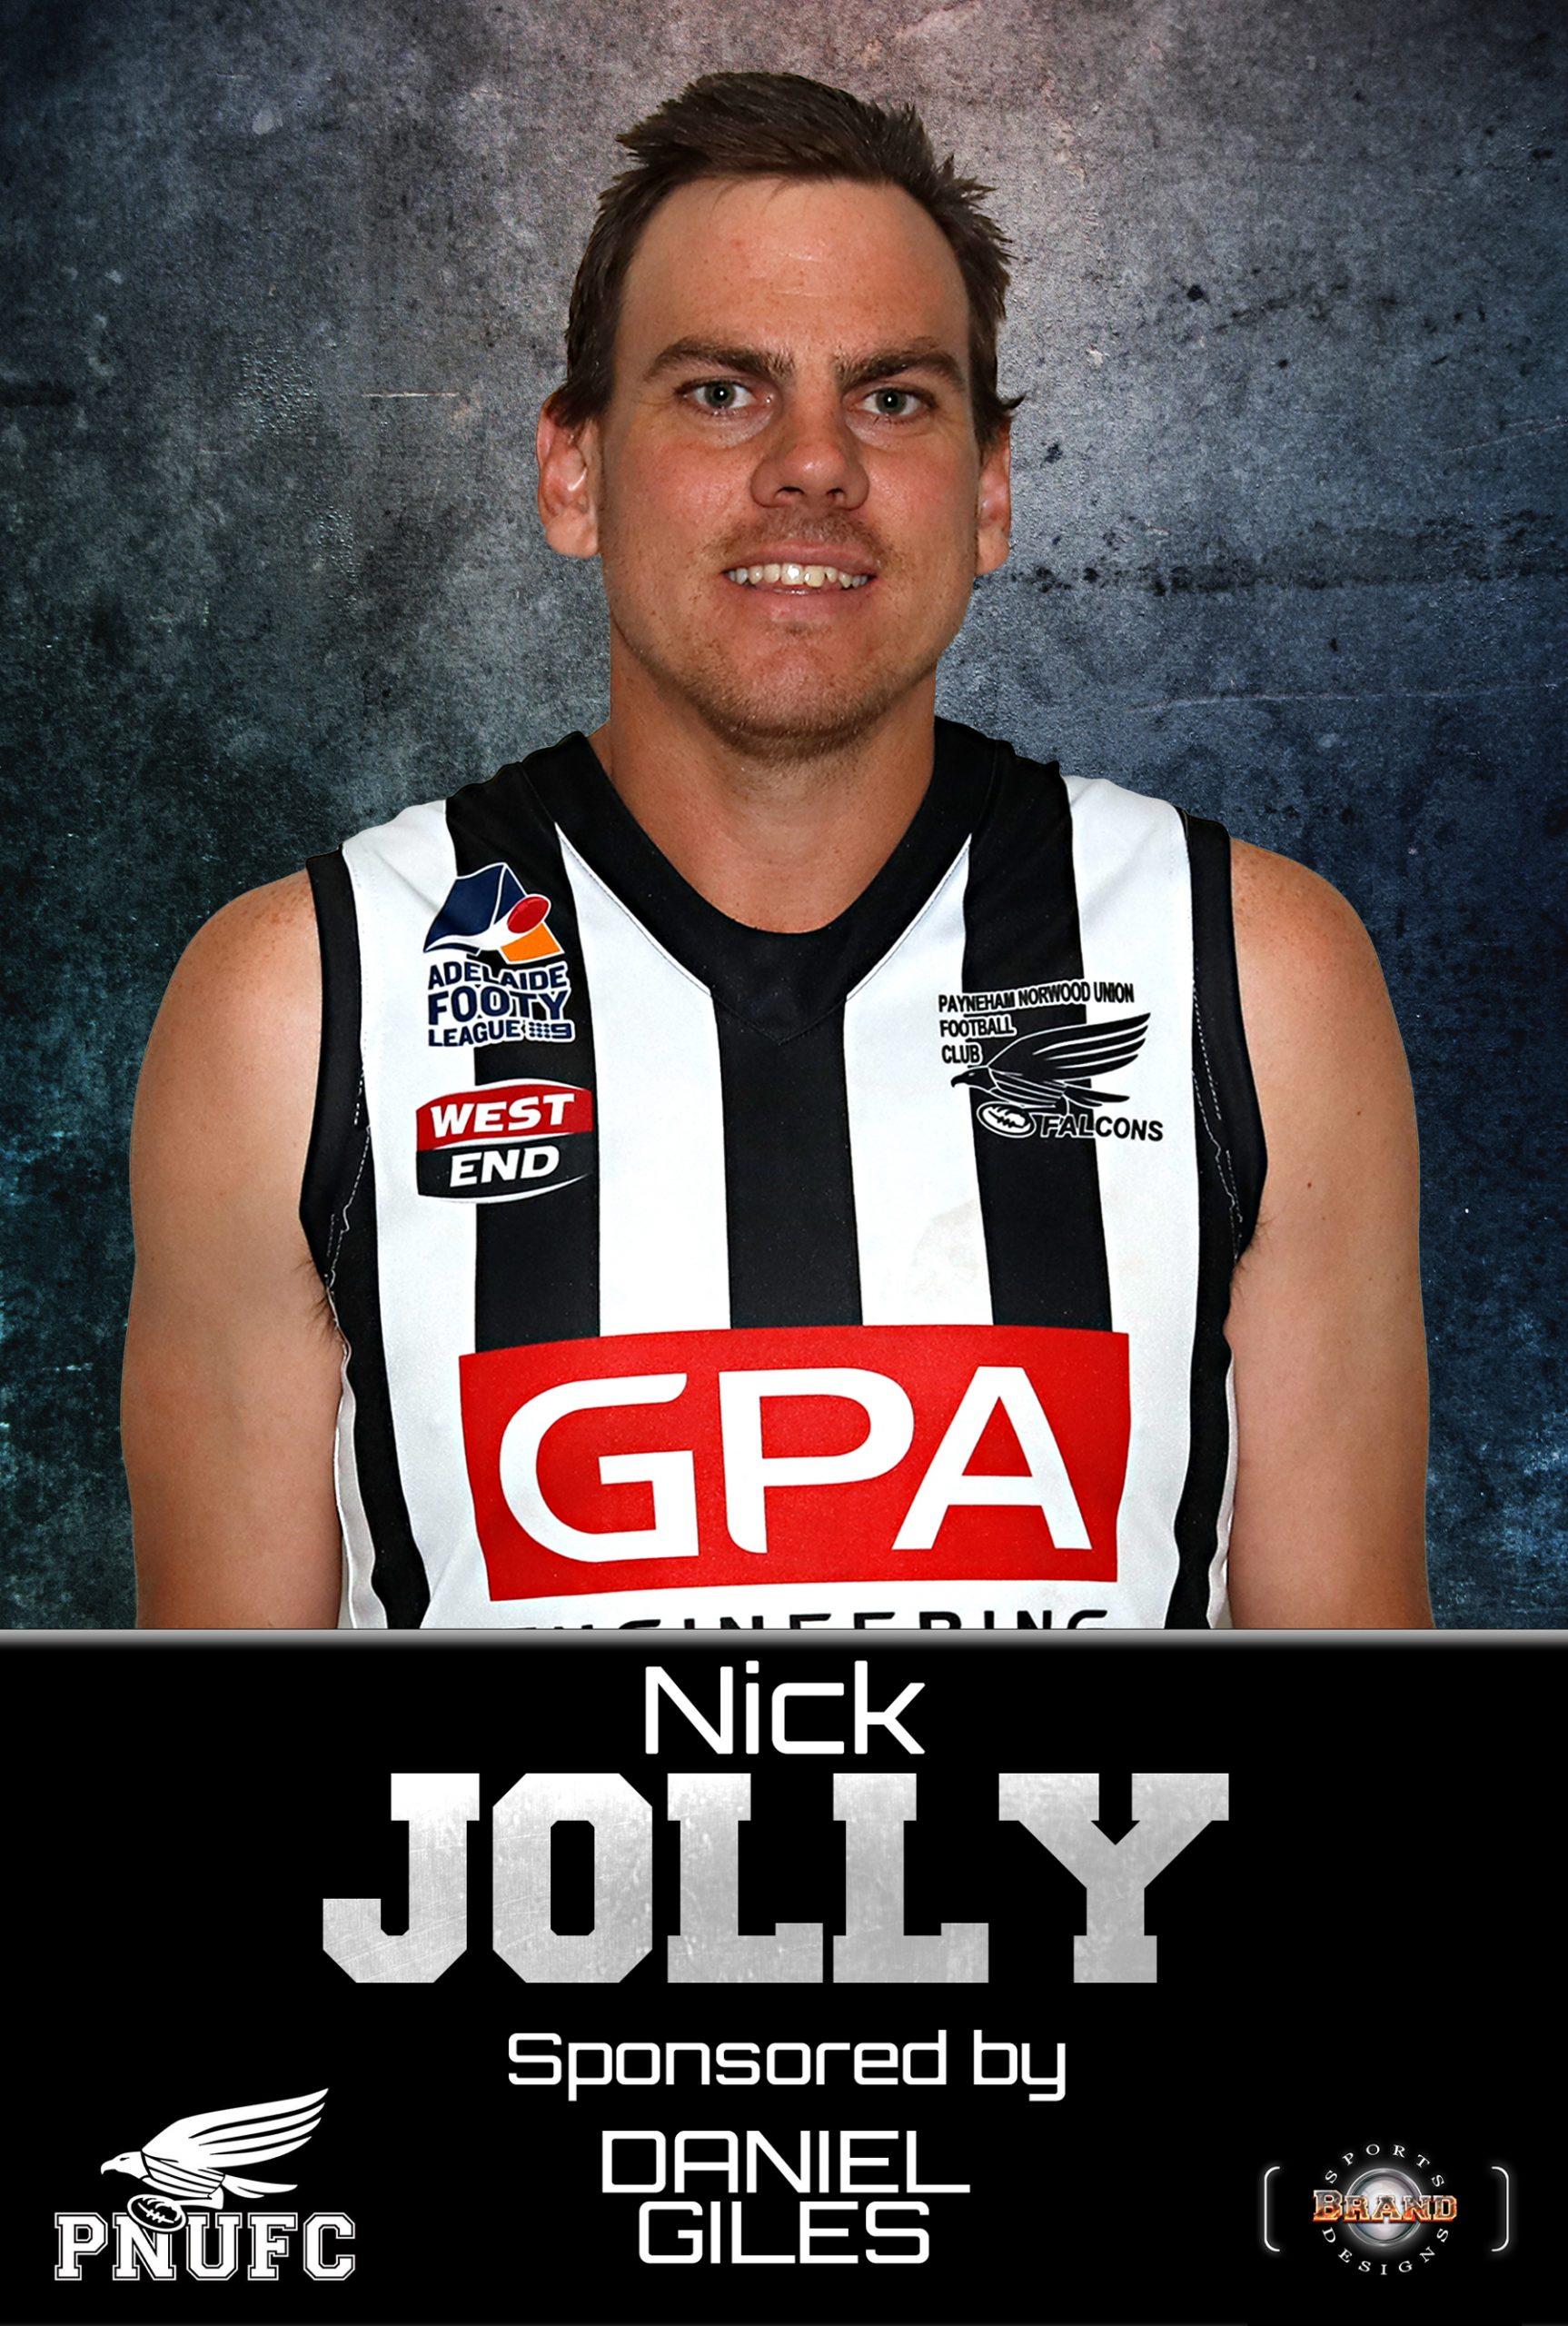 Nick Jolly